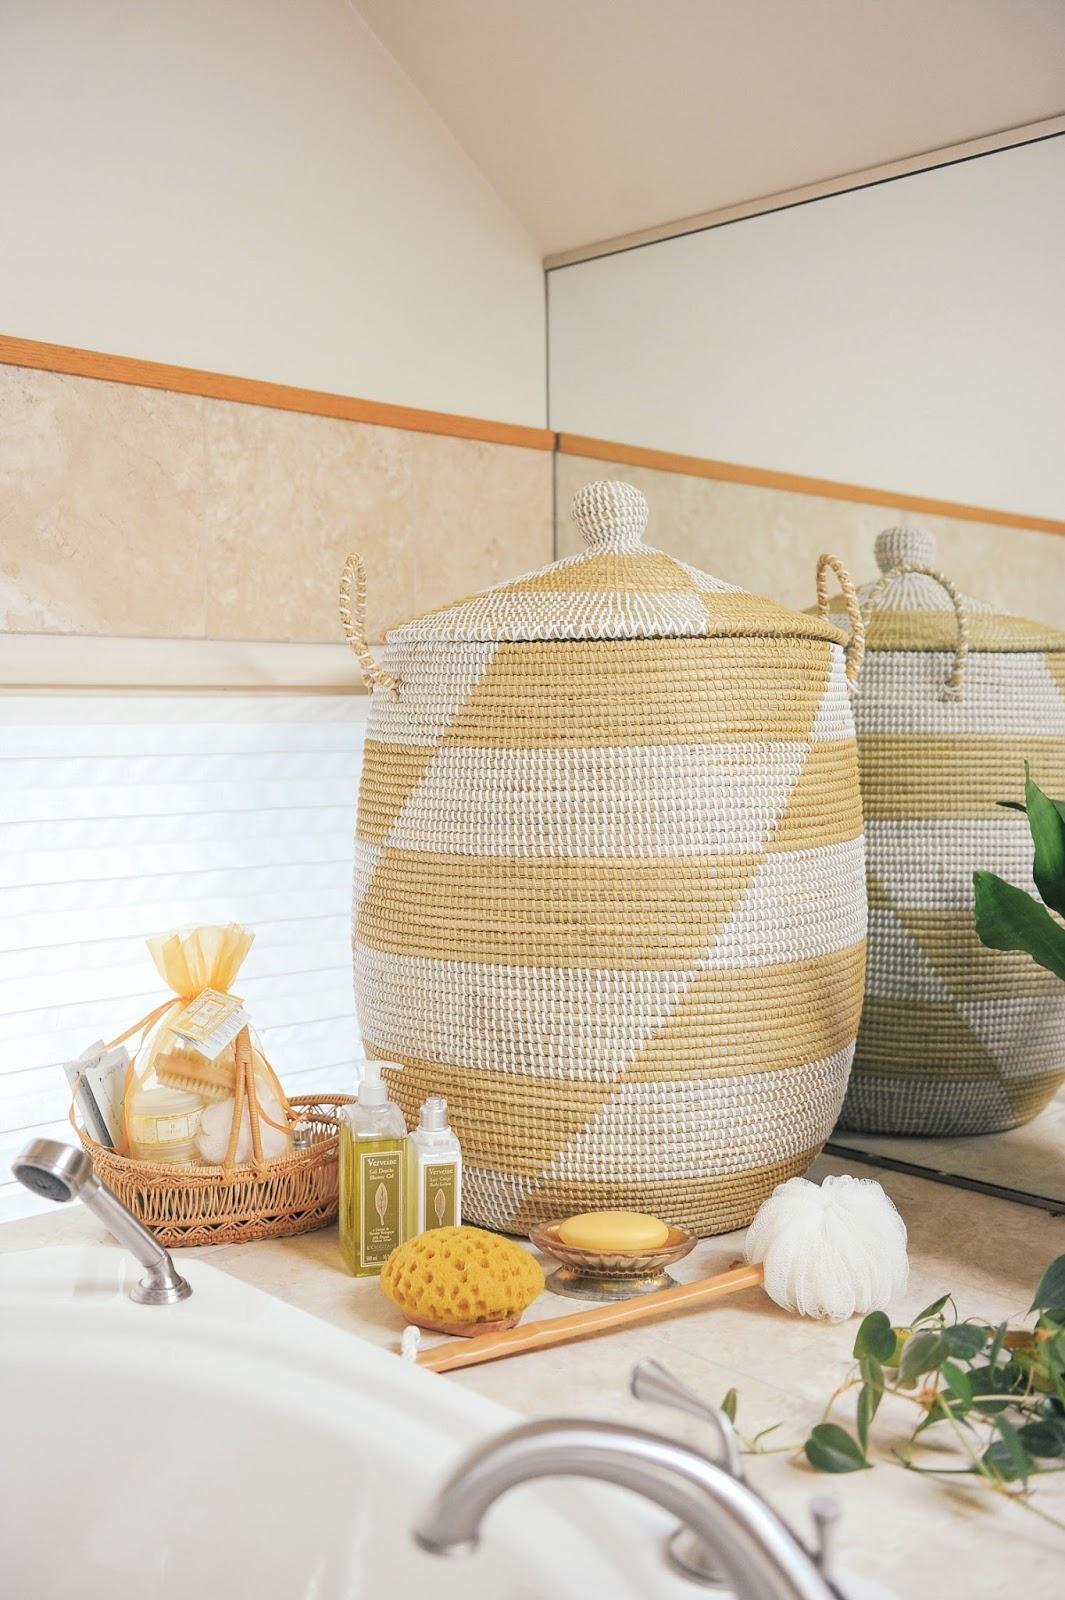 Modern Bathroom Organization Serena & Lily La Jolla Basket